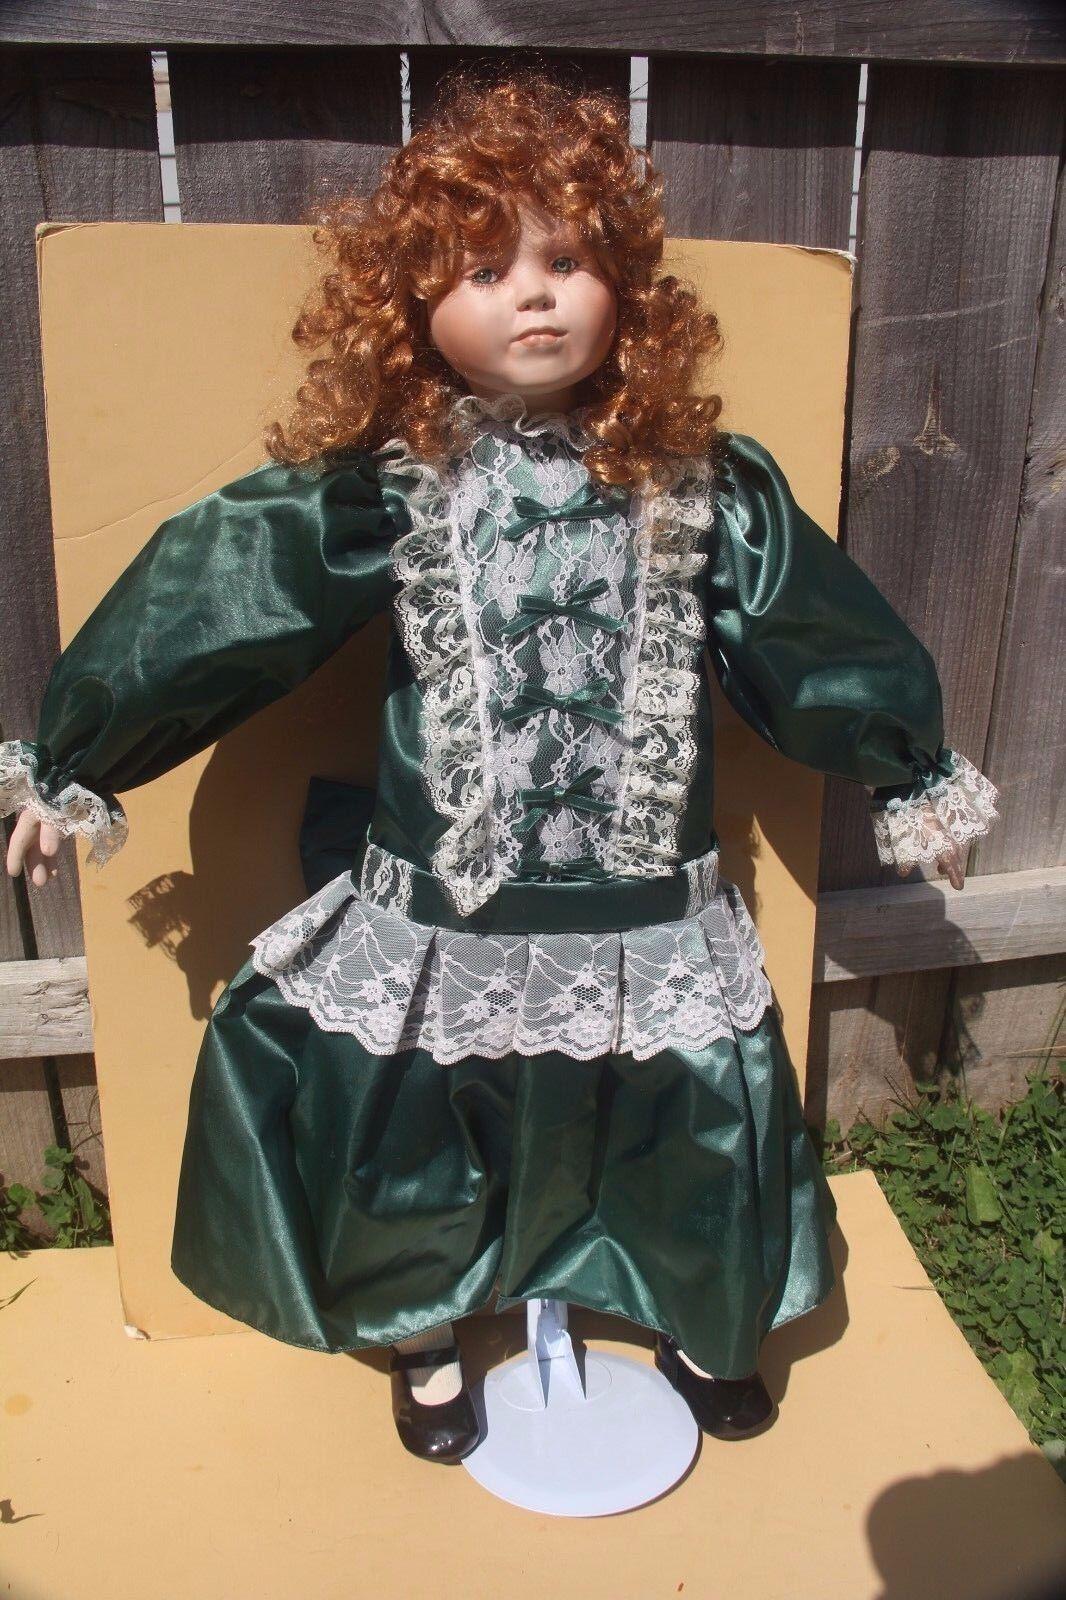 Norma Rambaud Doll World Gallery 13 500 Ltd 32  alto victoriano Regina Cabeza Rojo